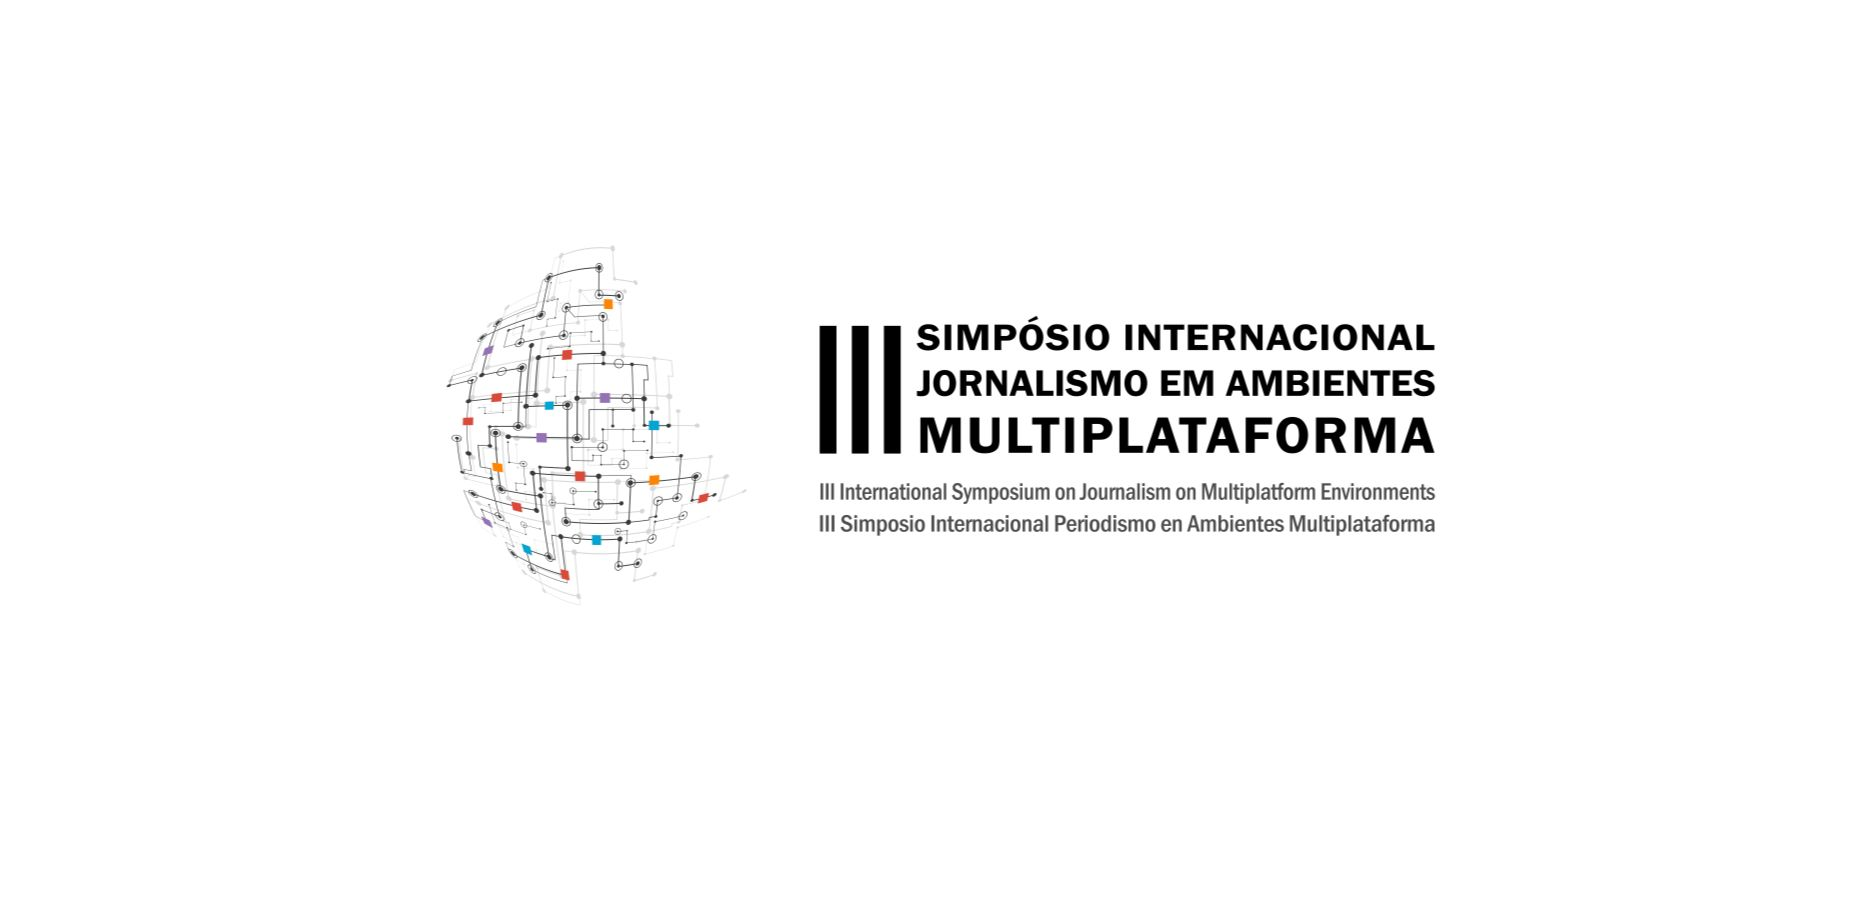 Simpósio Internacional Jornalismo em Ambientes Multiplataforma